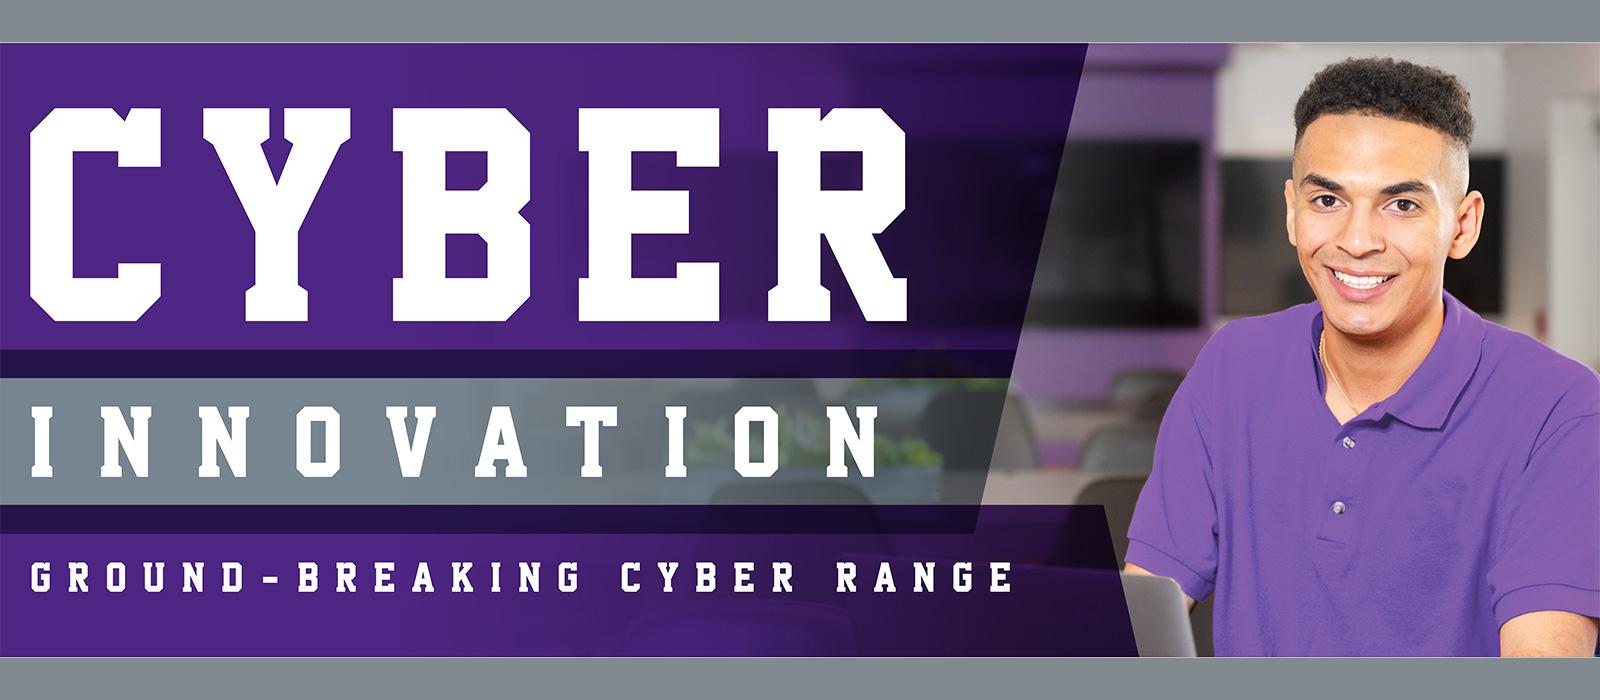 Cyber Innovation